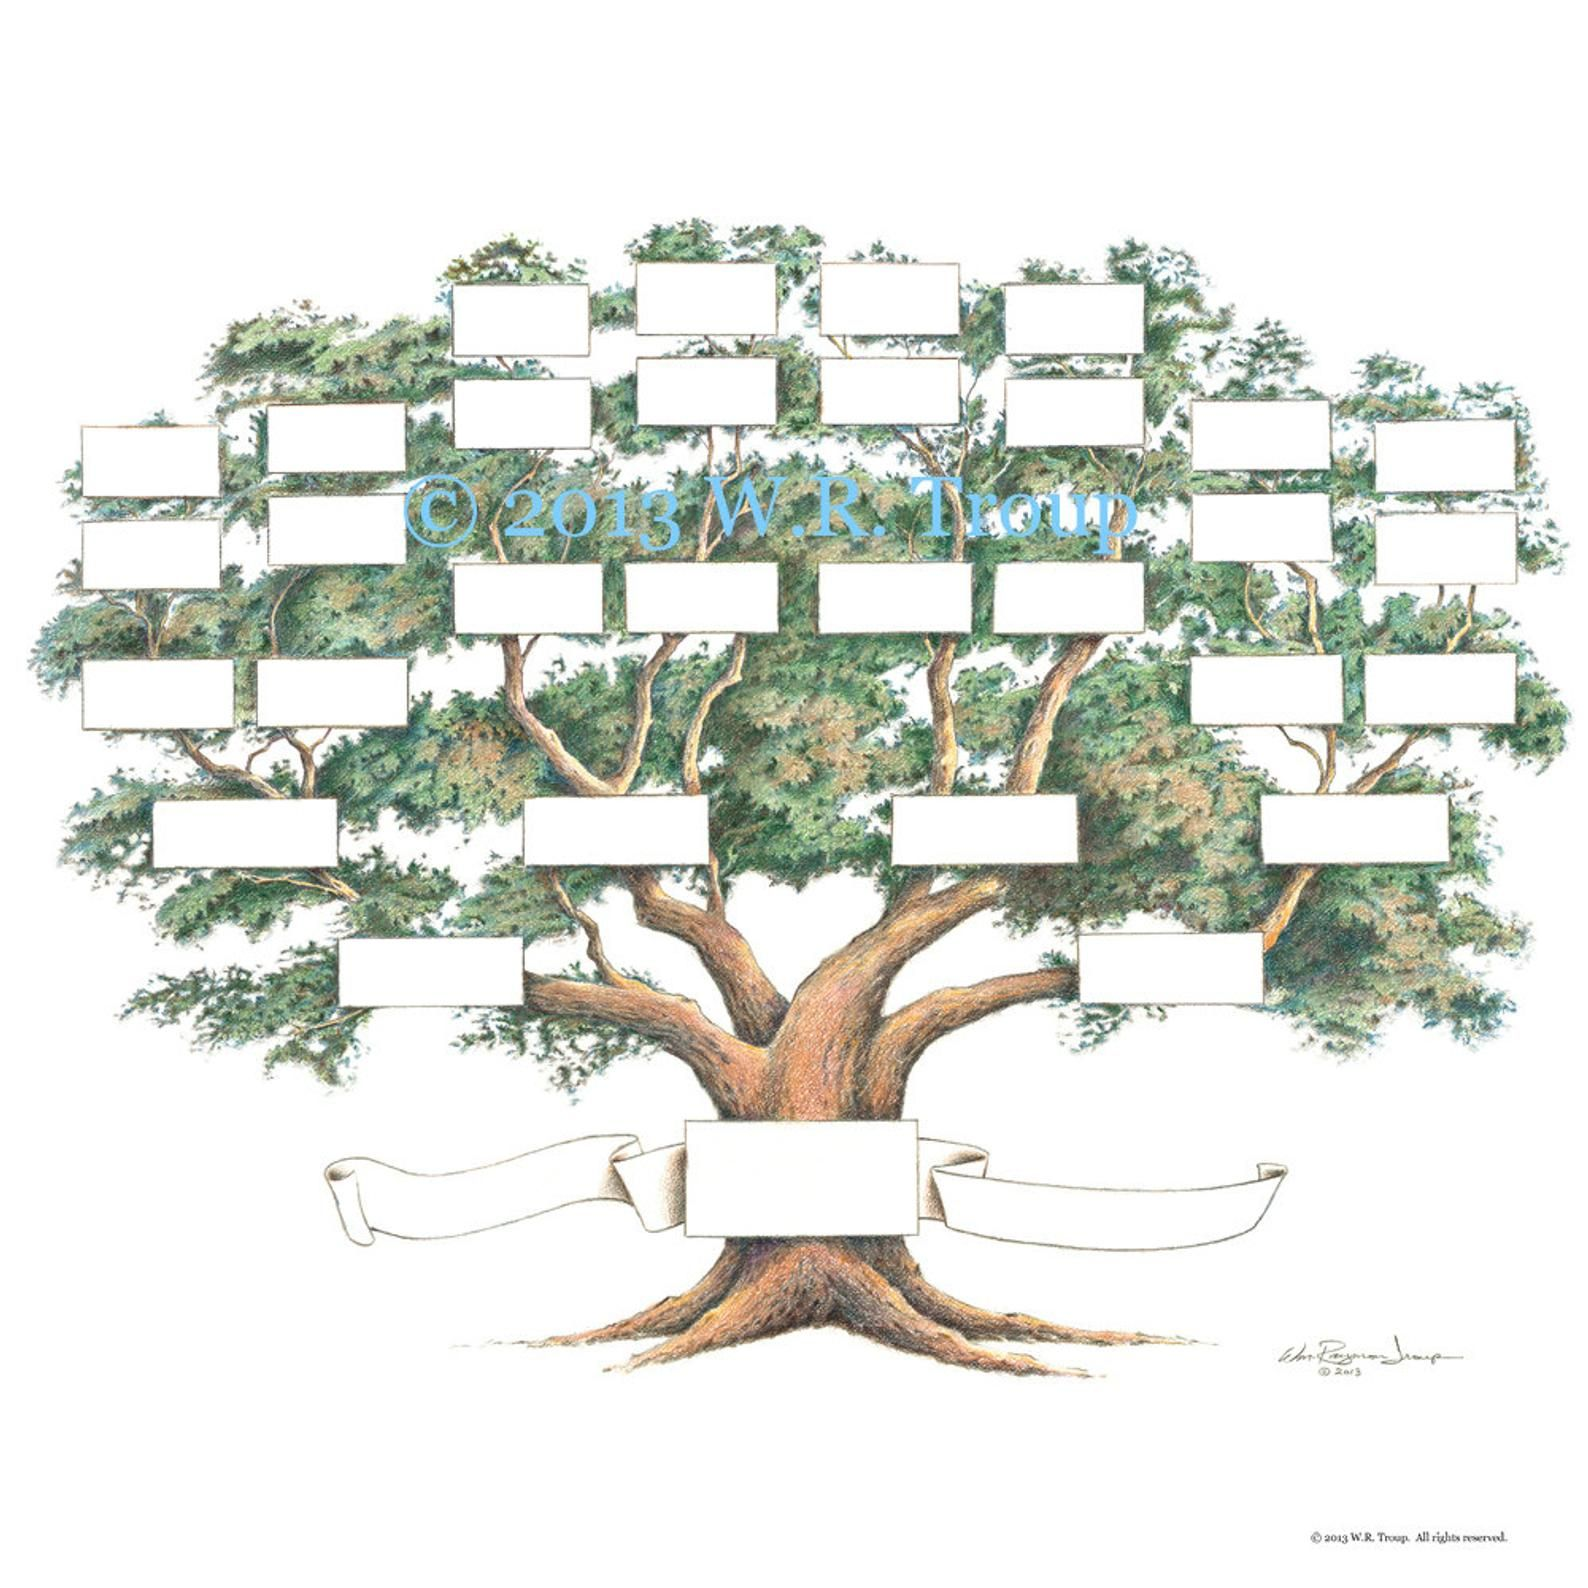 Family Tree Scrapbook Chart 12x12 Inch 5 6 Generations Ancestry Chart Pedigree Chart Genealogy Pet Pedigree In 2021 Family Tree Designs Family Tree Chart Blank Family Tree